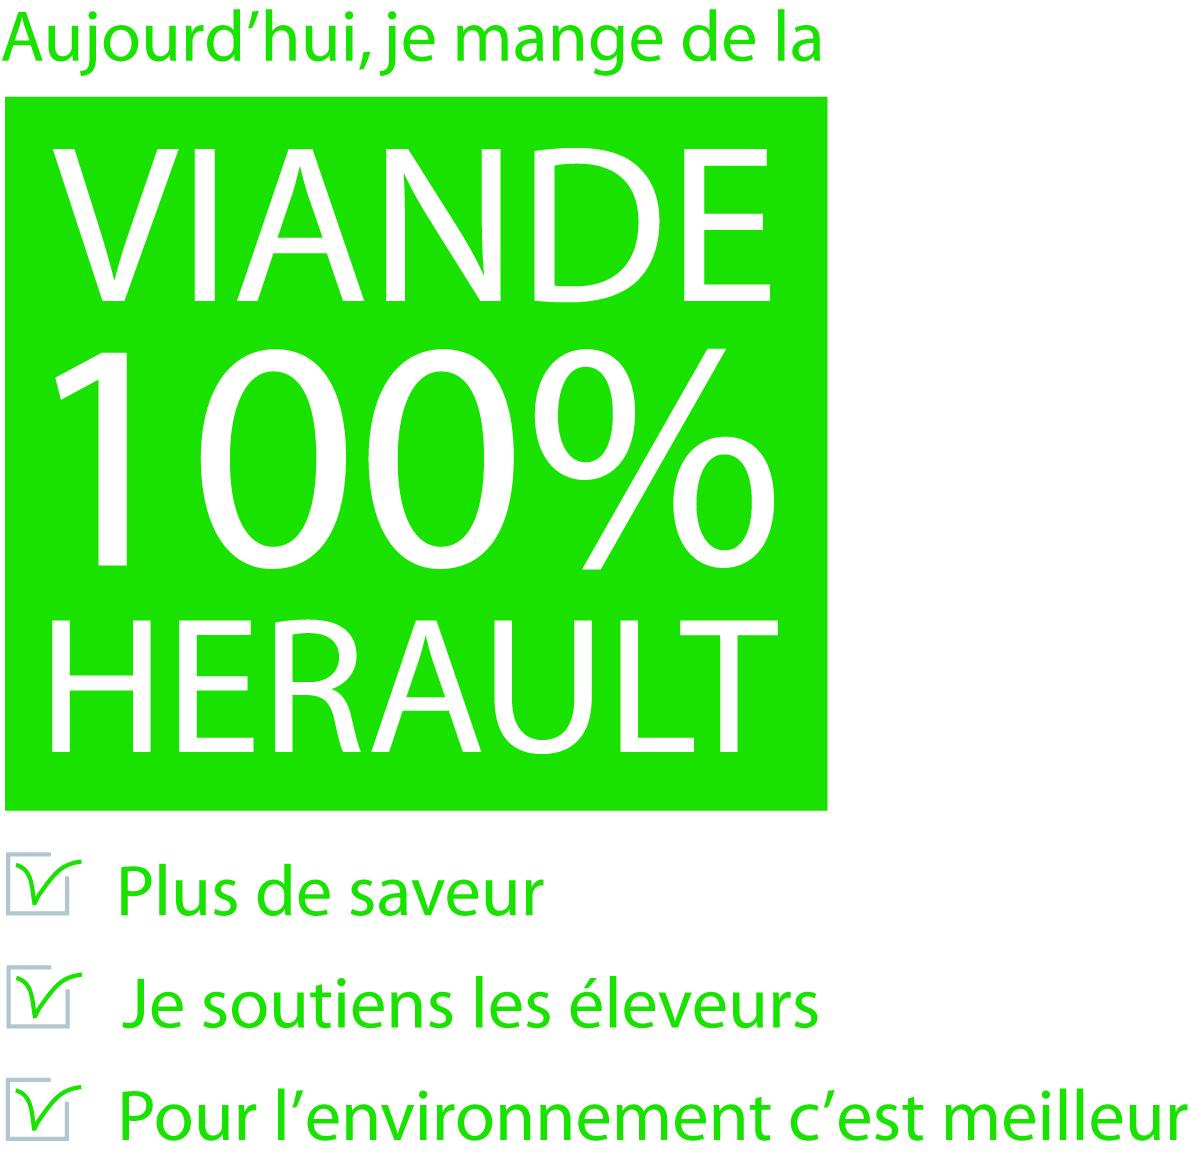 100 viande herault